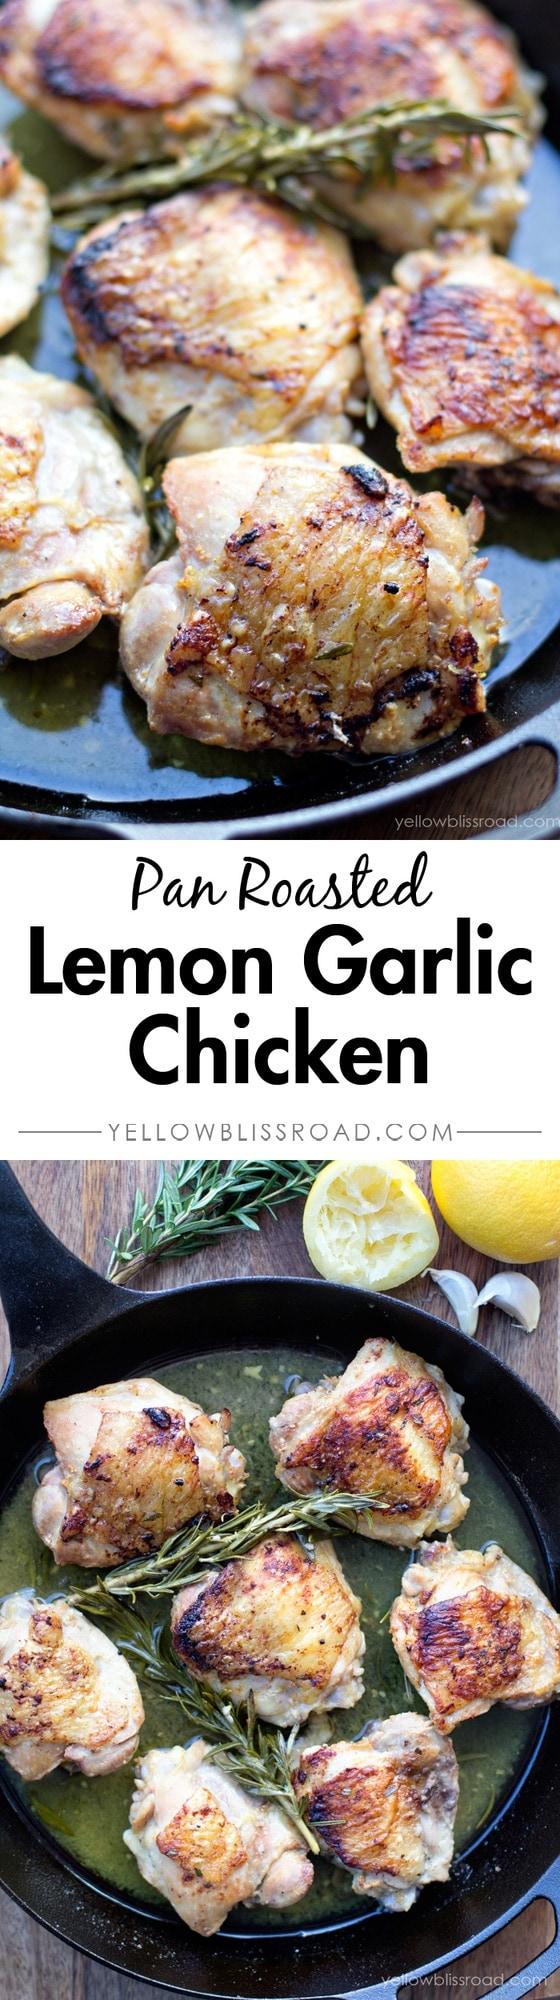 Pan Roasted Lemon Garlic & Rosemary Chicken